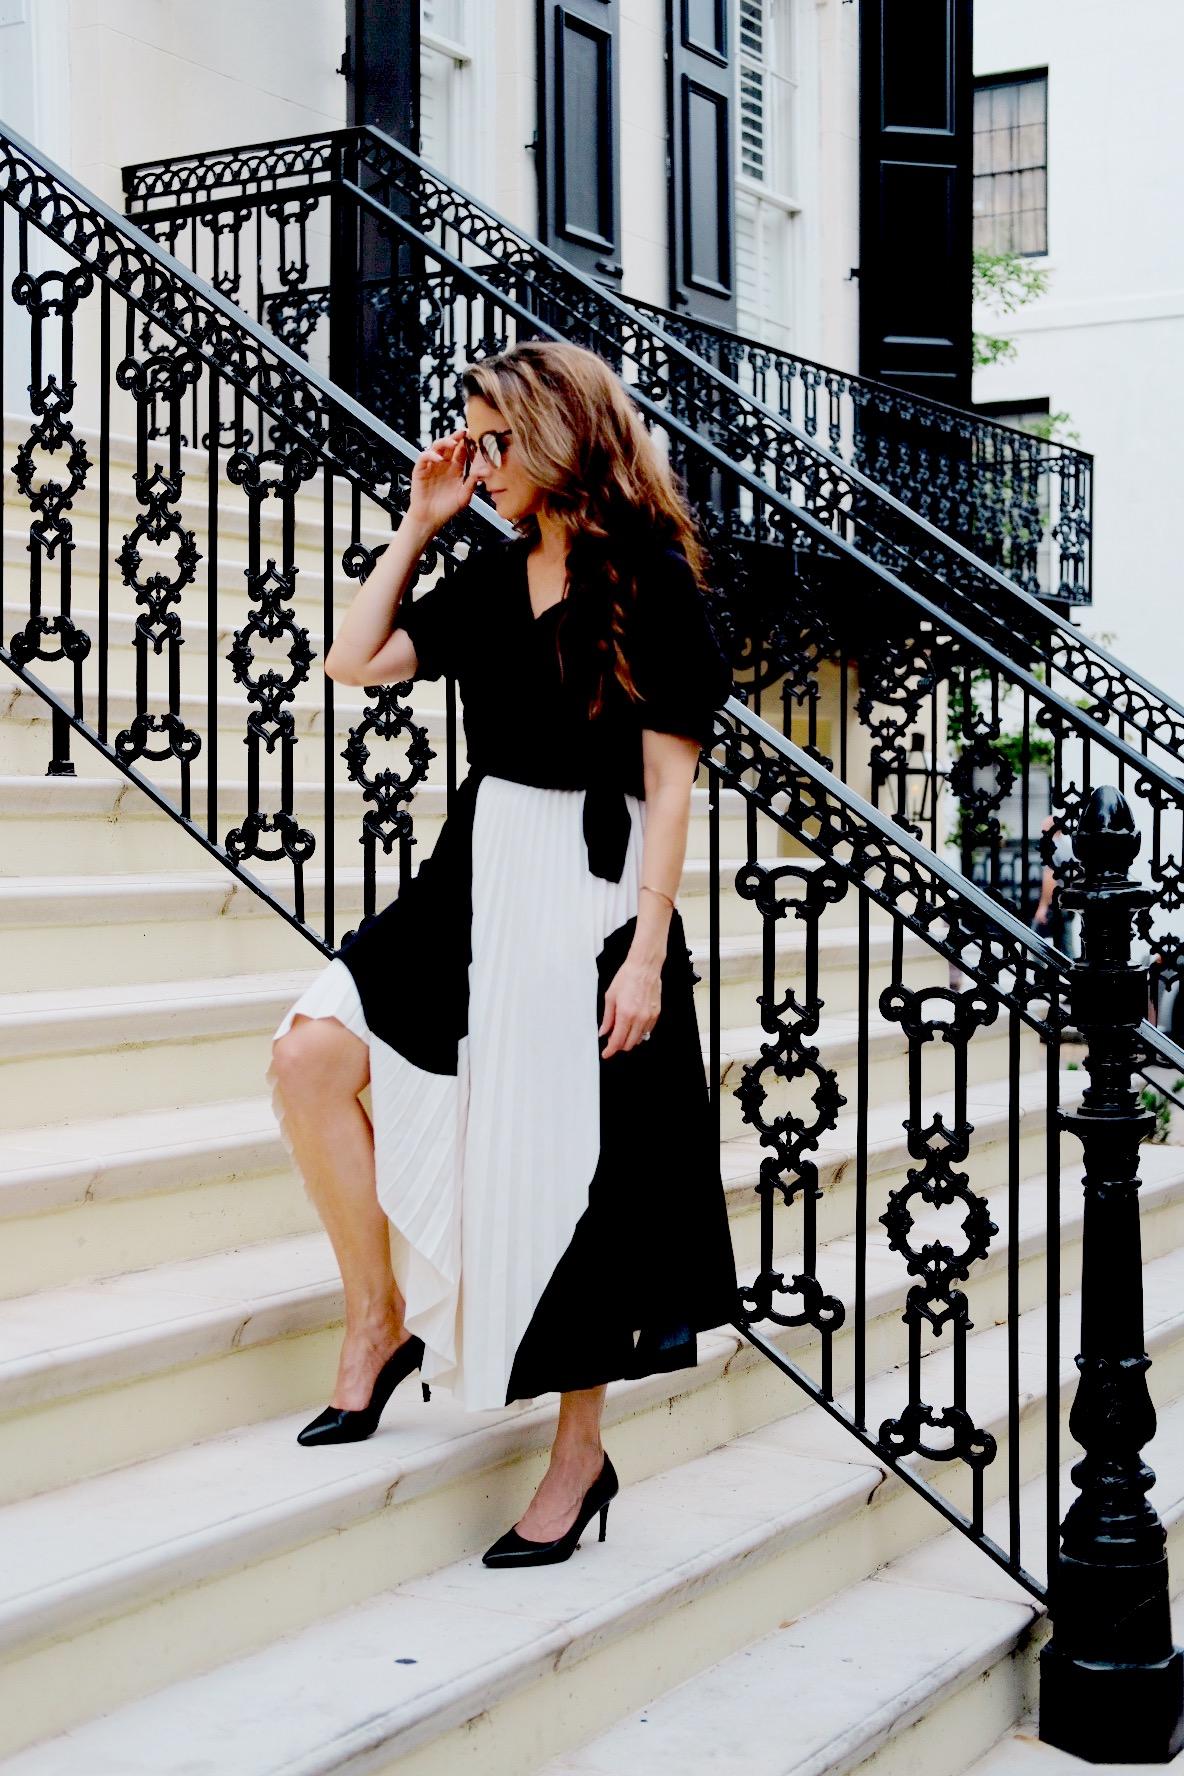 Brenna Lauren Michaels in Black and White Skirt on marble staircase in Savannah, Georgia